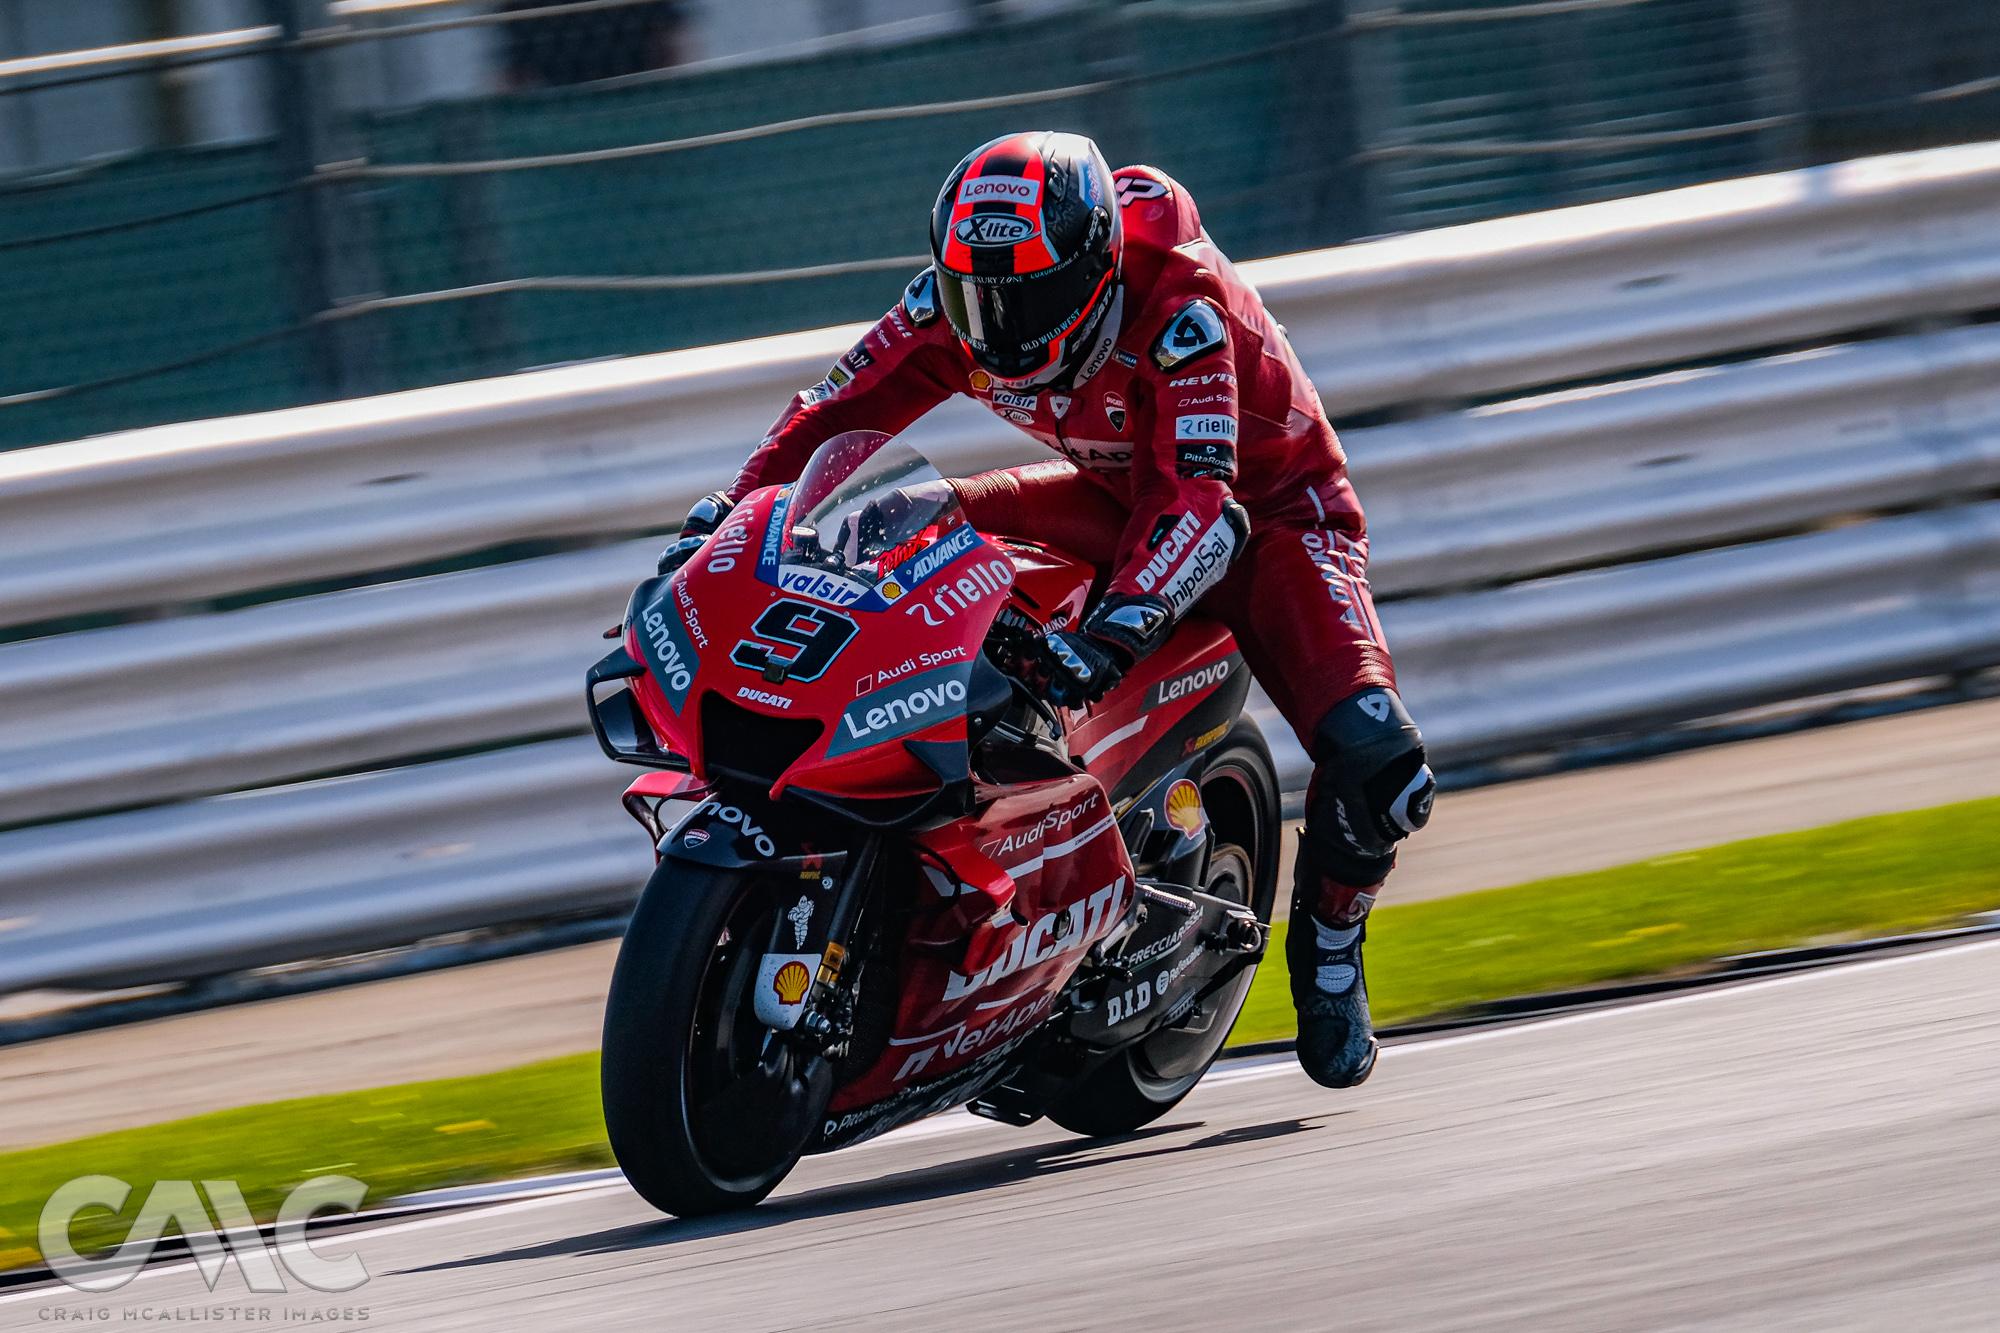 CMC_MotoGP_FP3_Silverstone 100-4004690.jpg